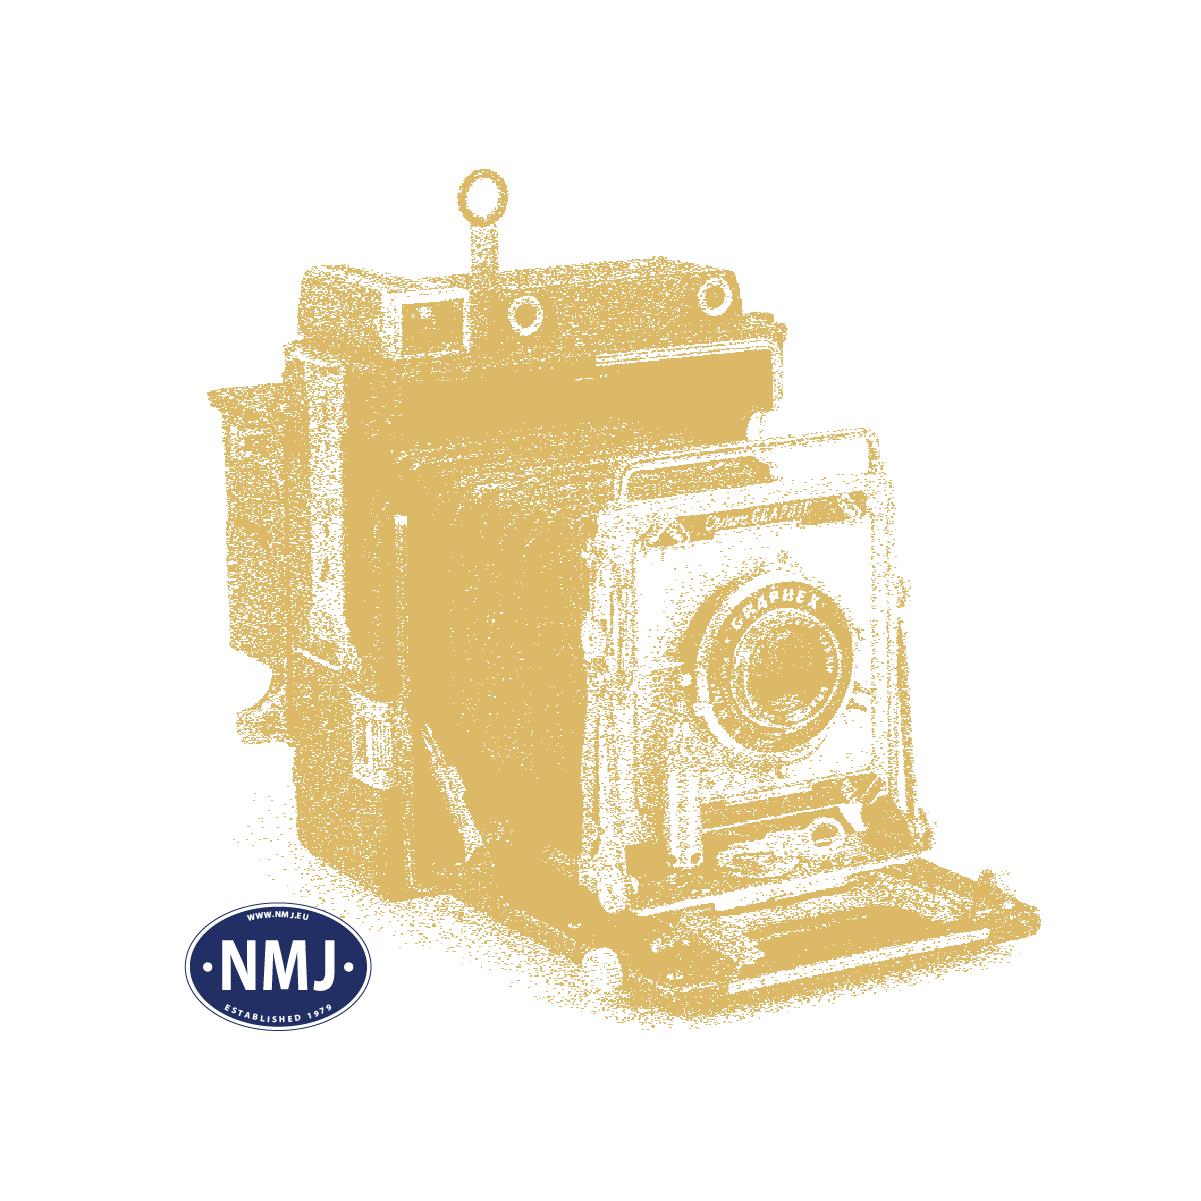 DK-8750073 - PBS Mx 1030, AC m/ Lyd